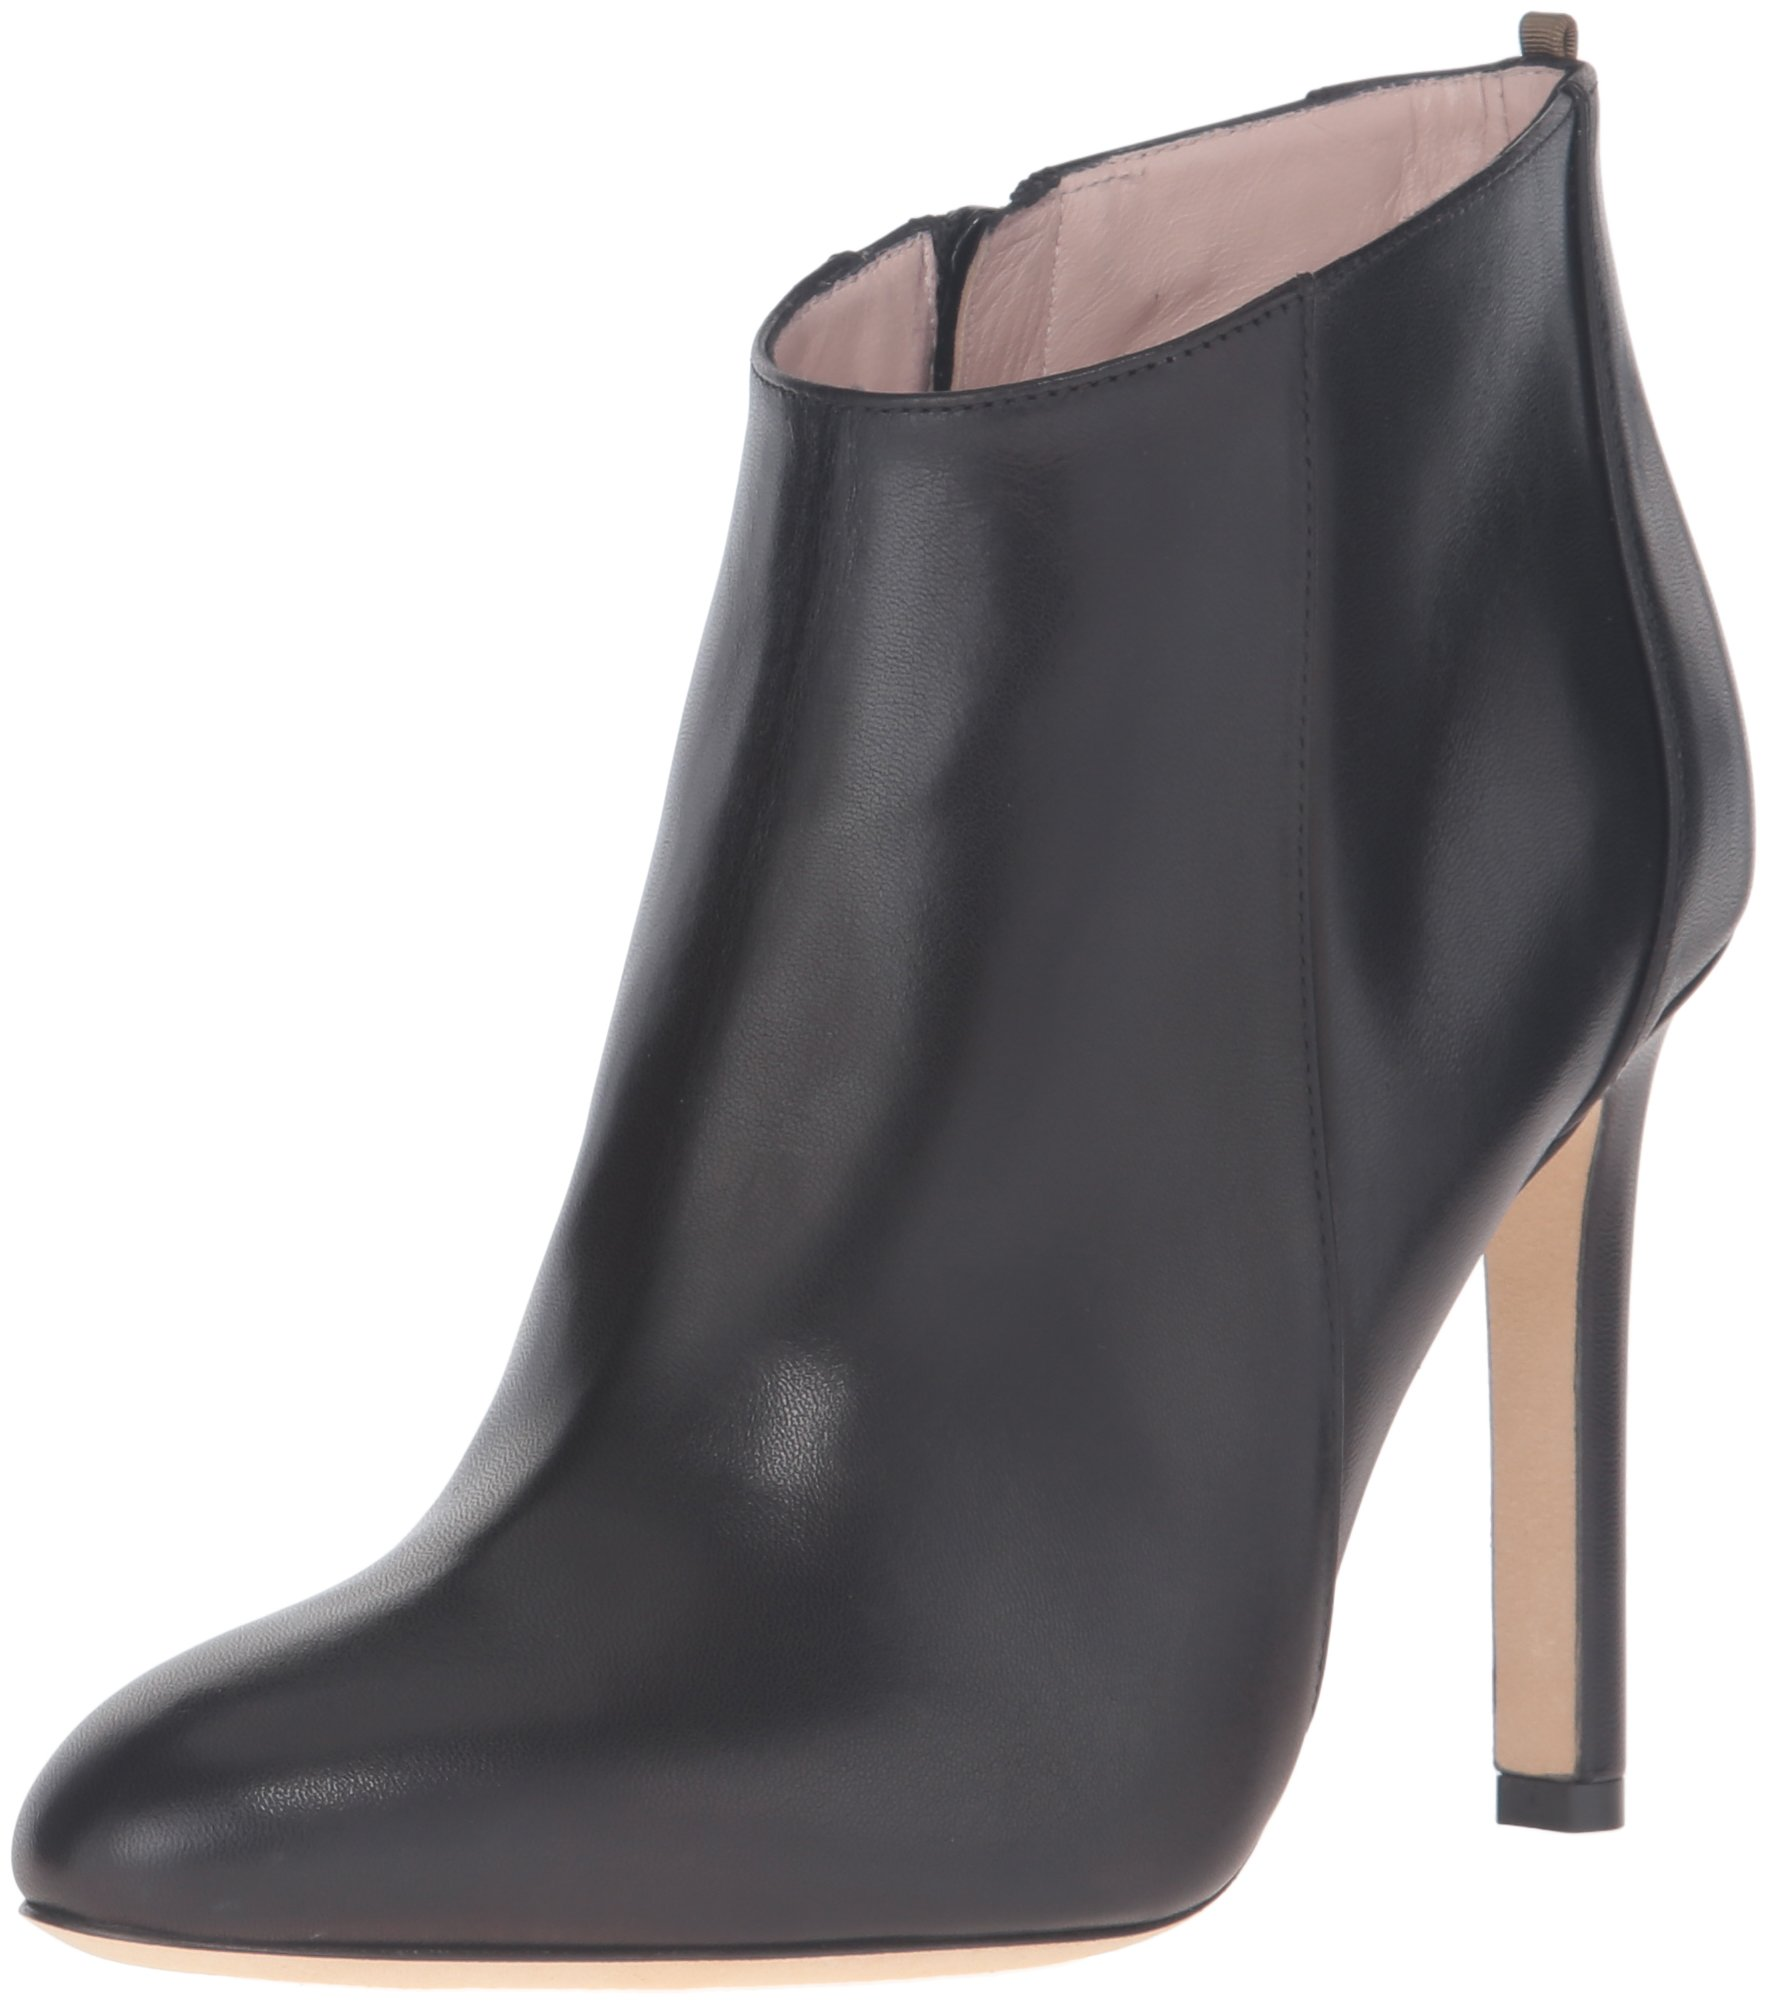 SJP by Sarah Jessica Parker Women's Neue Dress Pump, Black Leather, 40 EU/9.5 M US